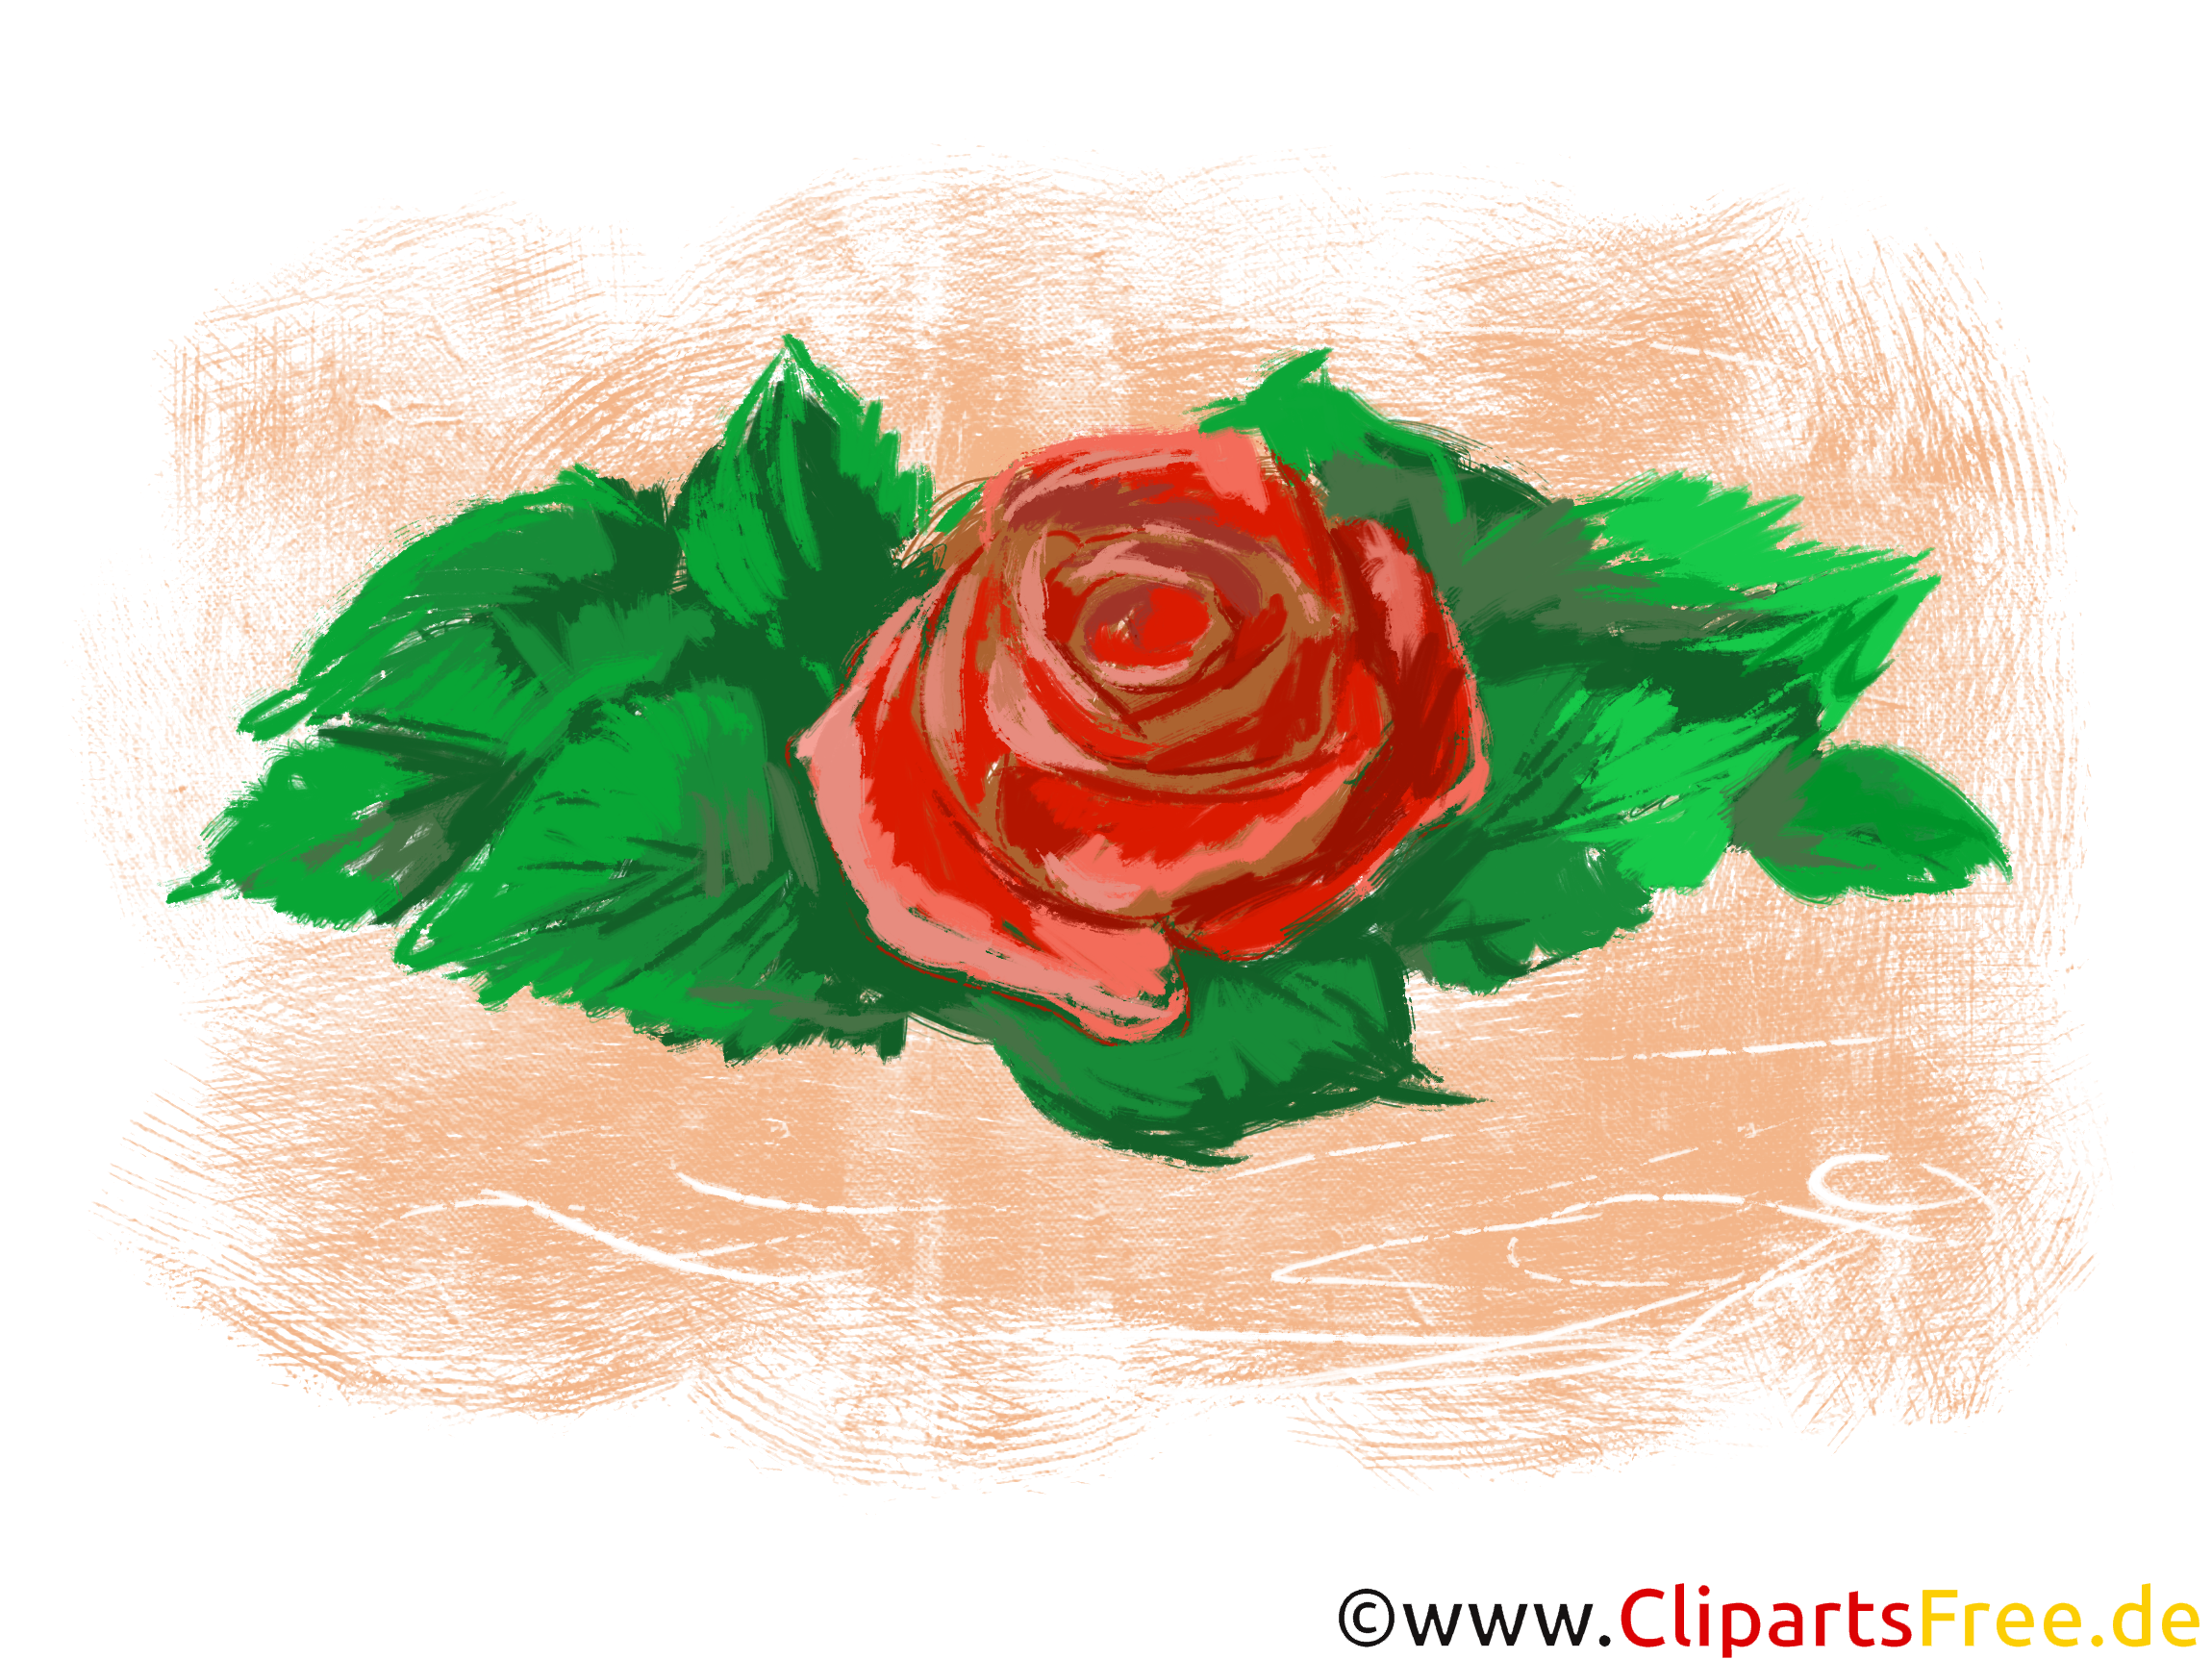 Rose Gemälde Clipart, Bild, Grafik kostenlos